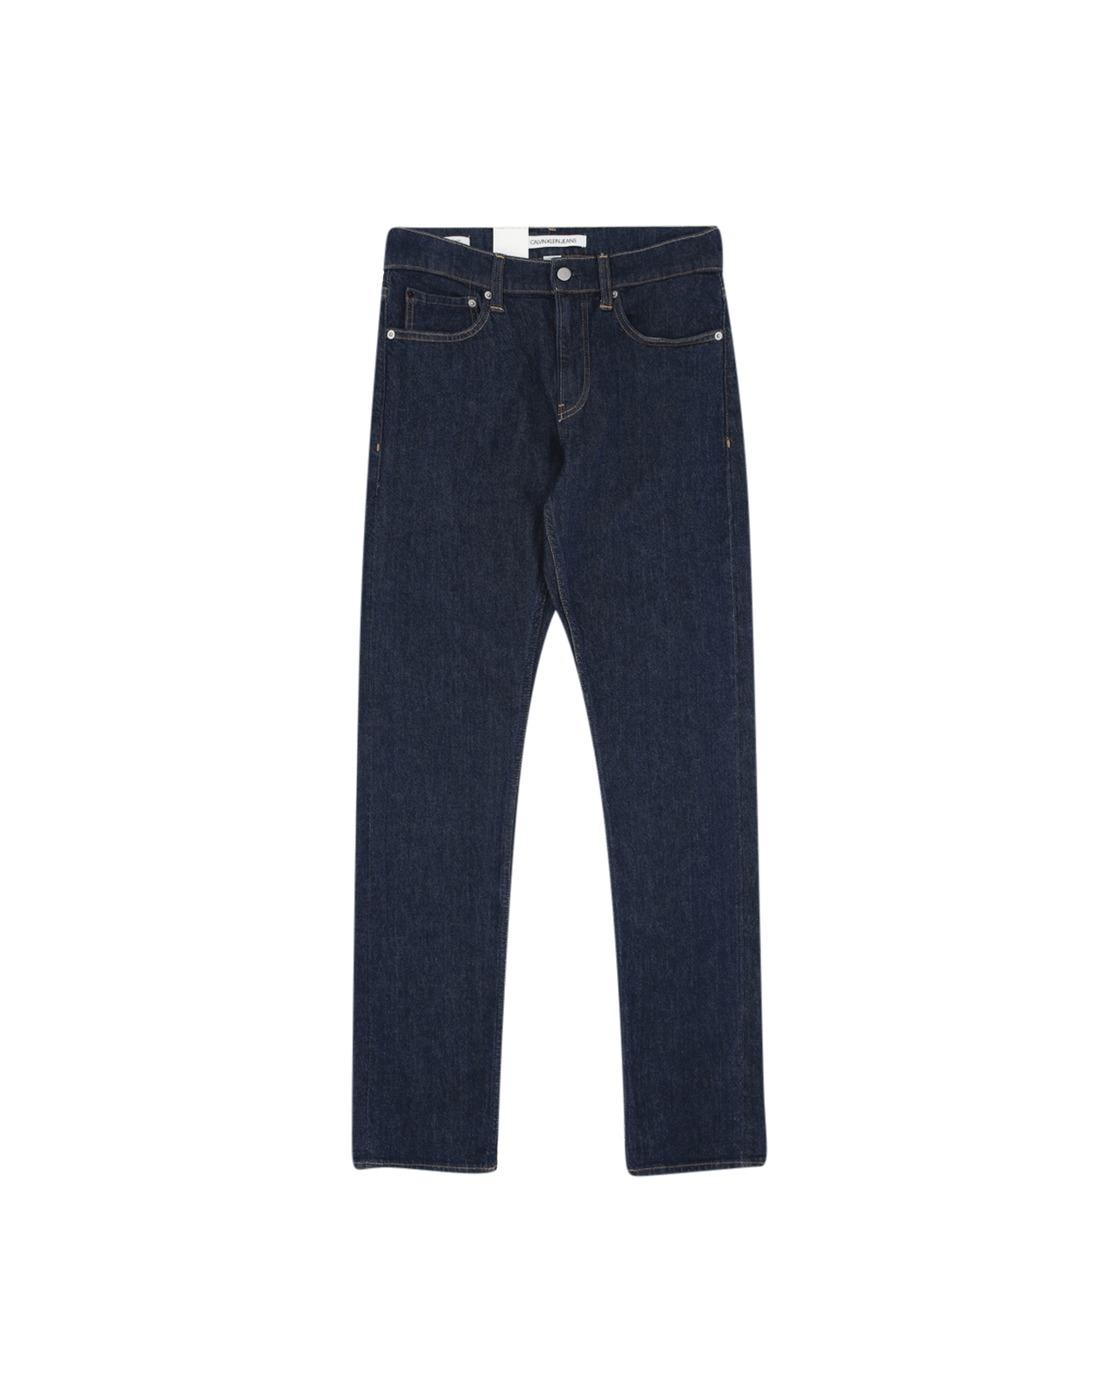 Photo: Calvin Klein Est. 1978 Ckj 026 Slim Jeans Rinse